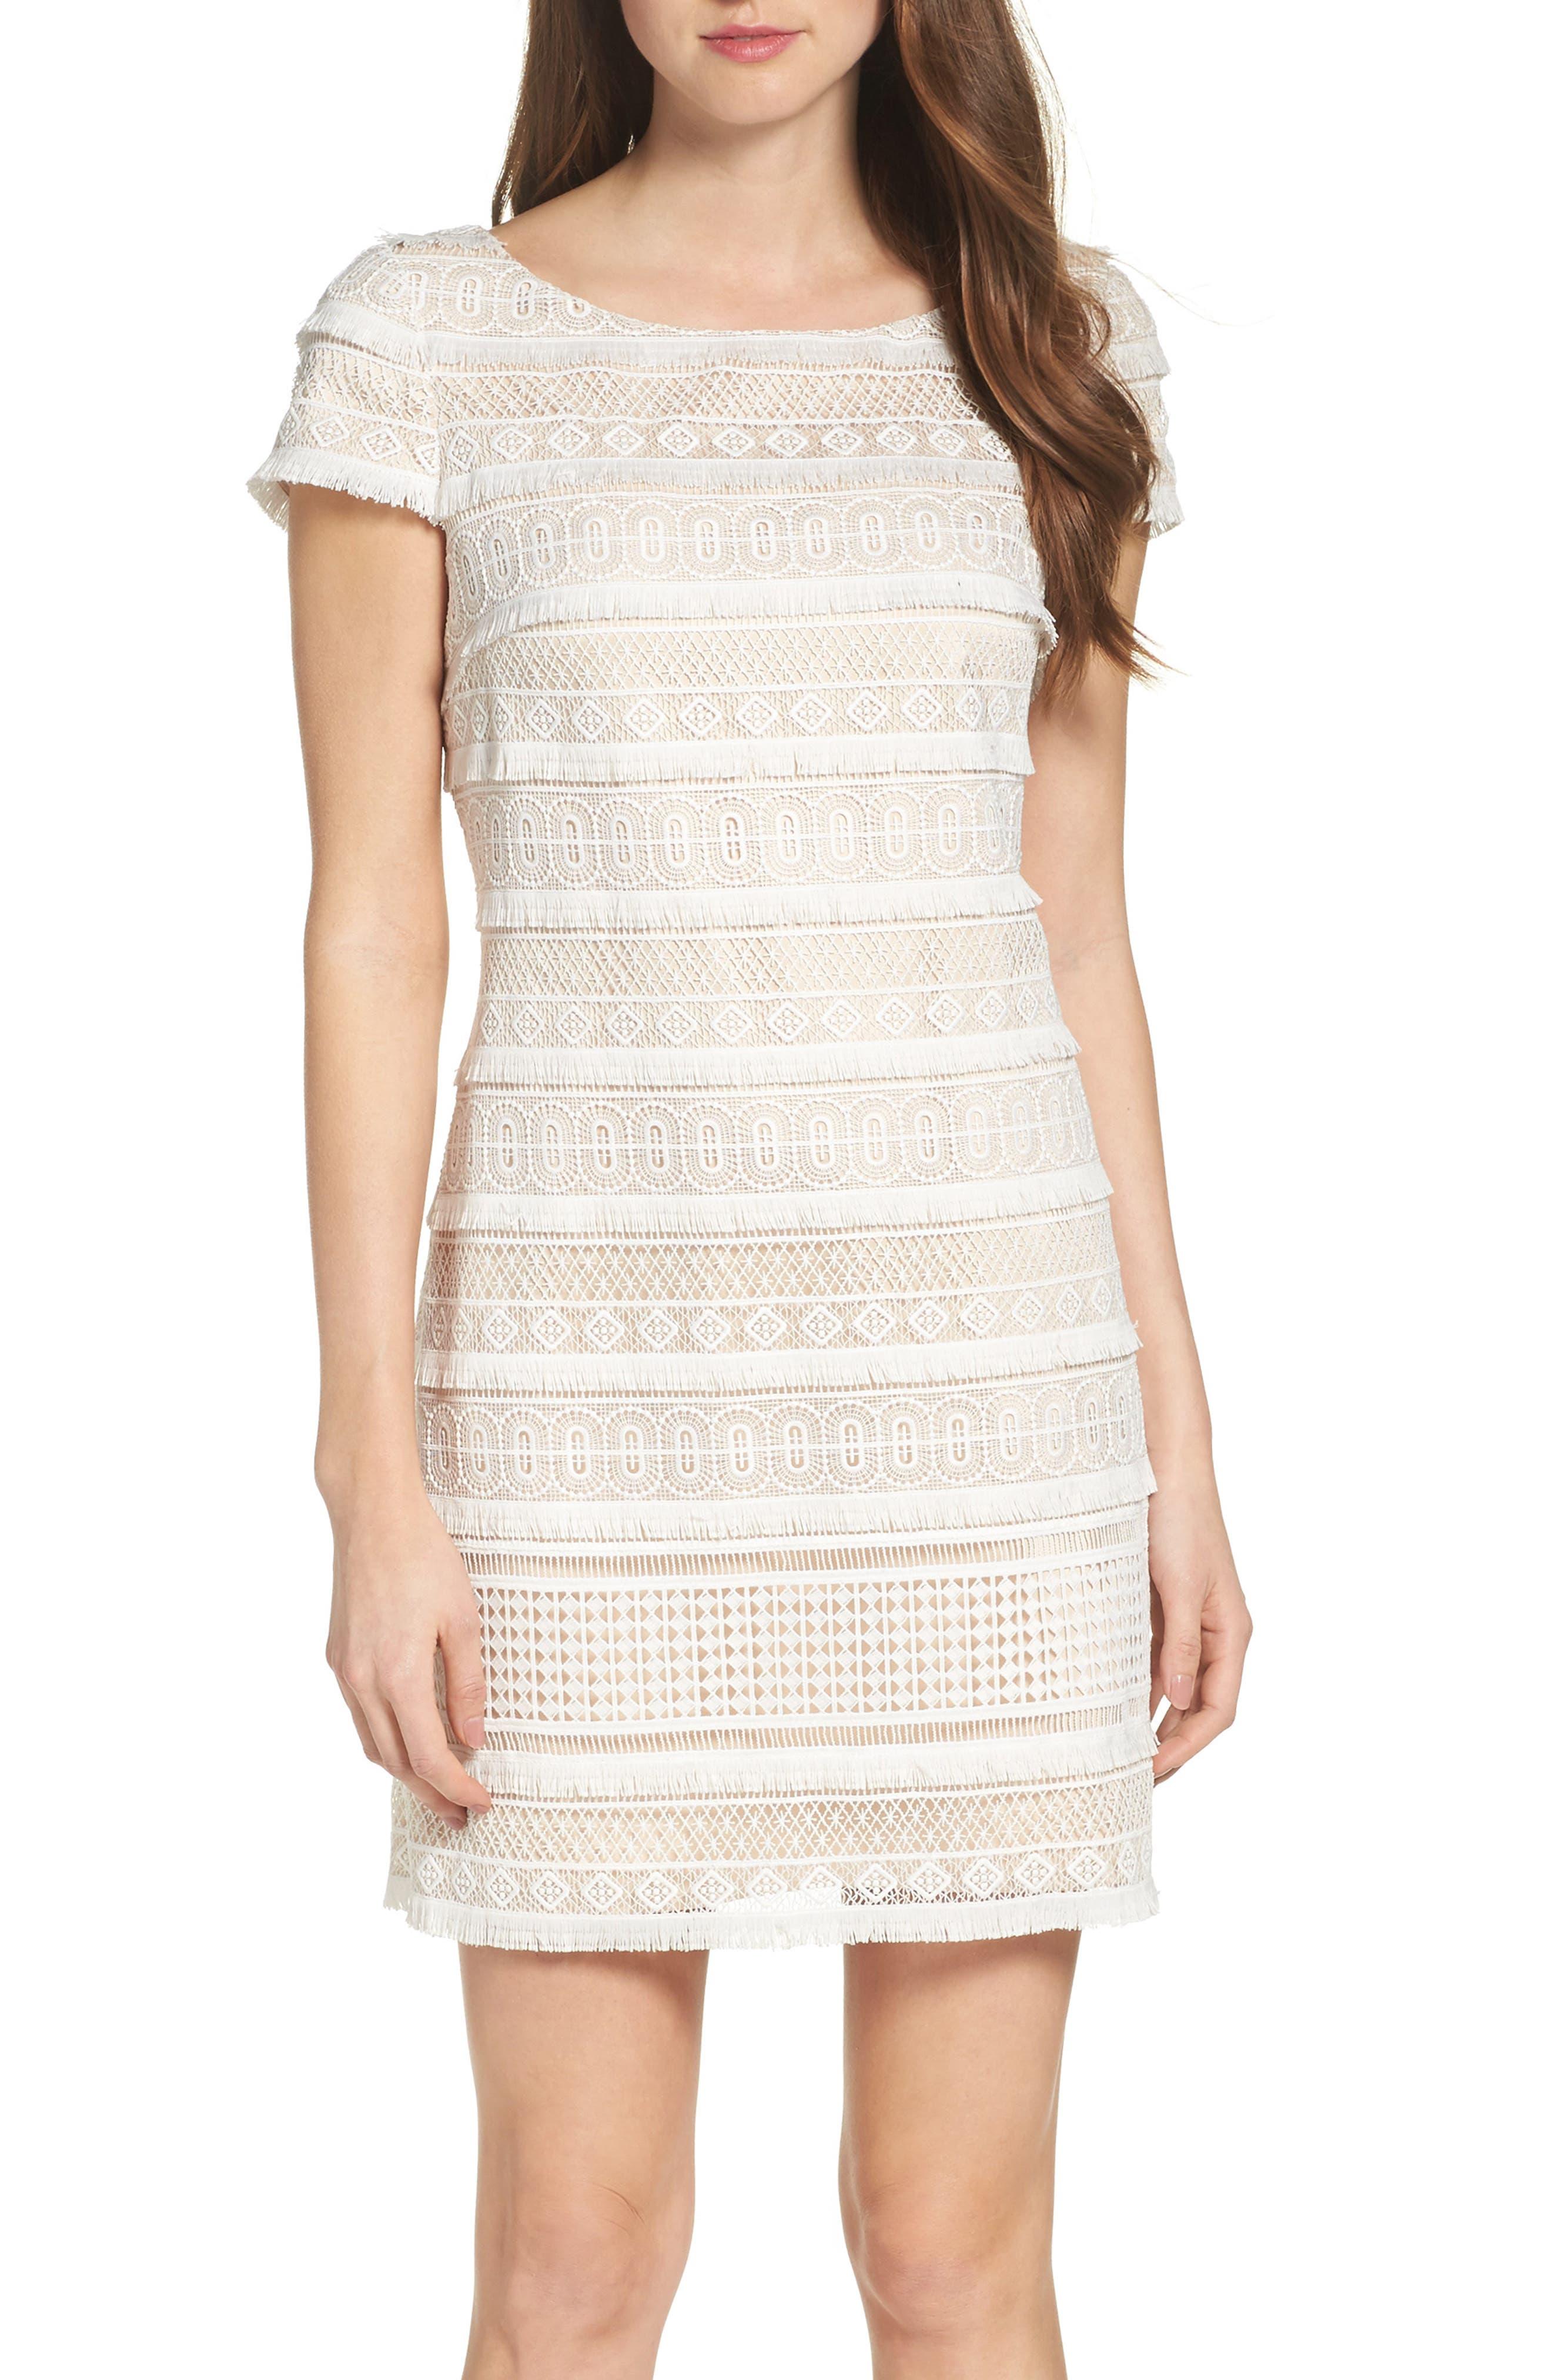 Alternate Image 1 Selected - Eliza J Lace Shift Dress (Regular & Petite)